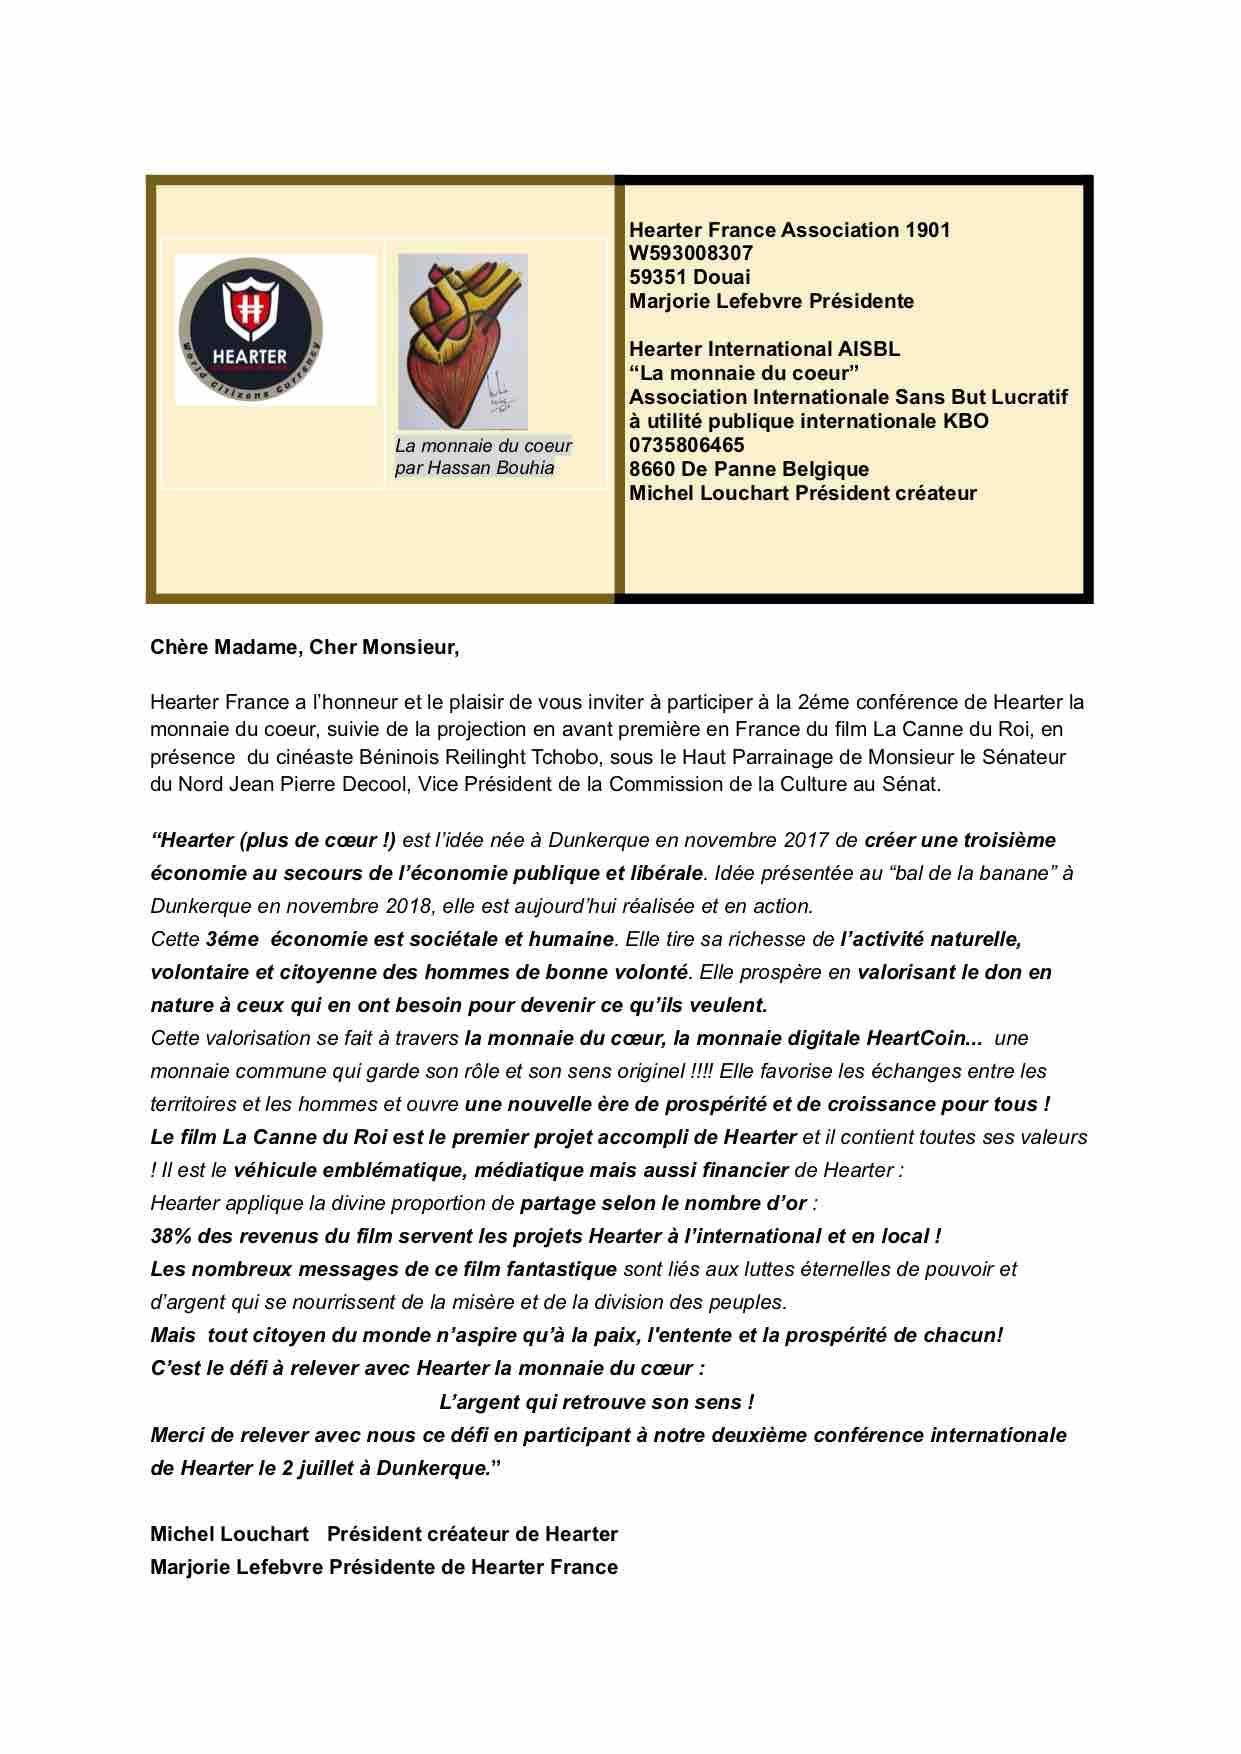 Dossier invitation dunkerque 2 juillet 2021